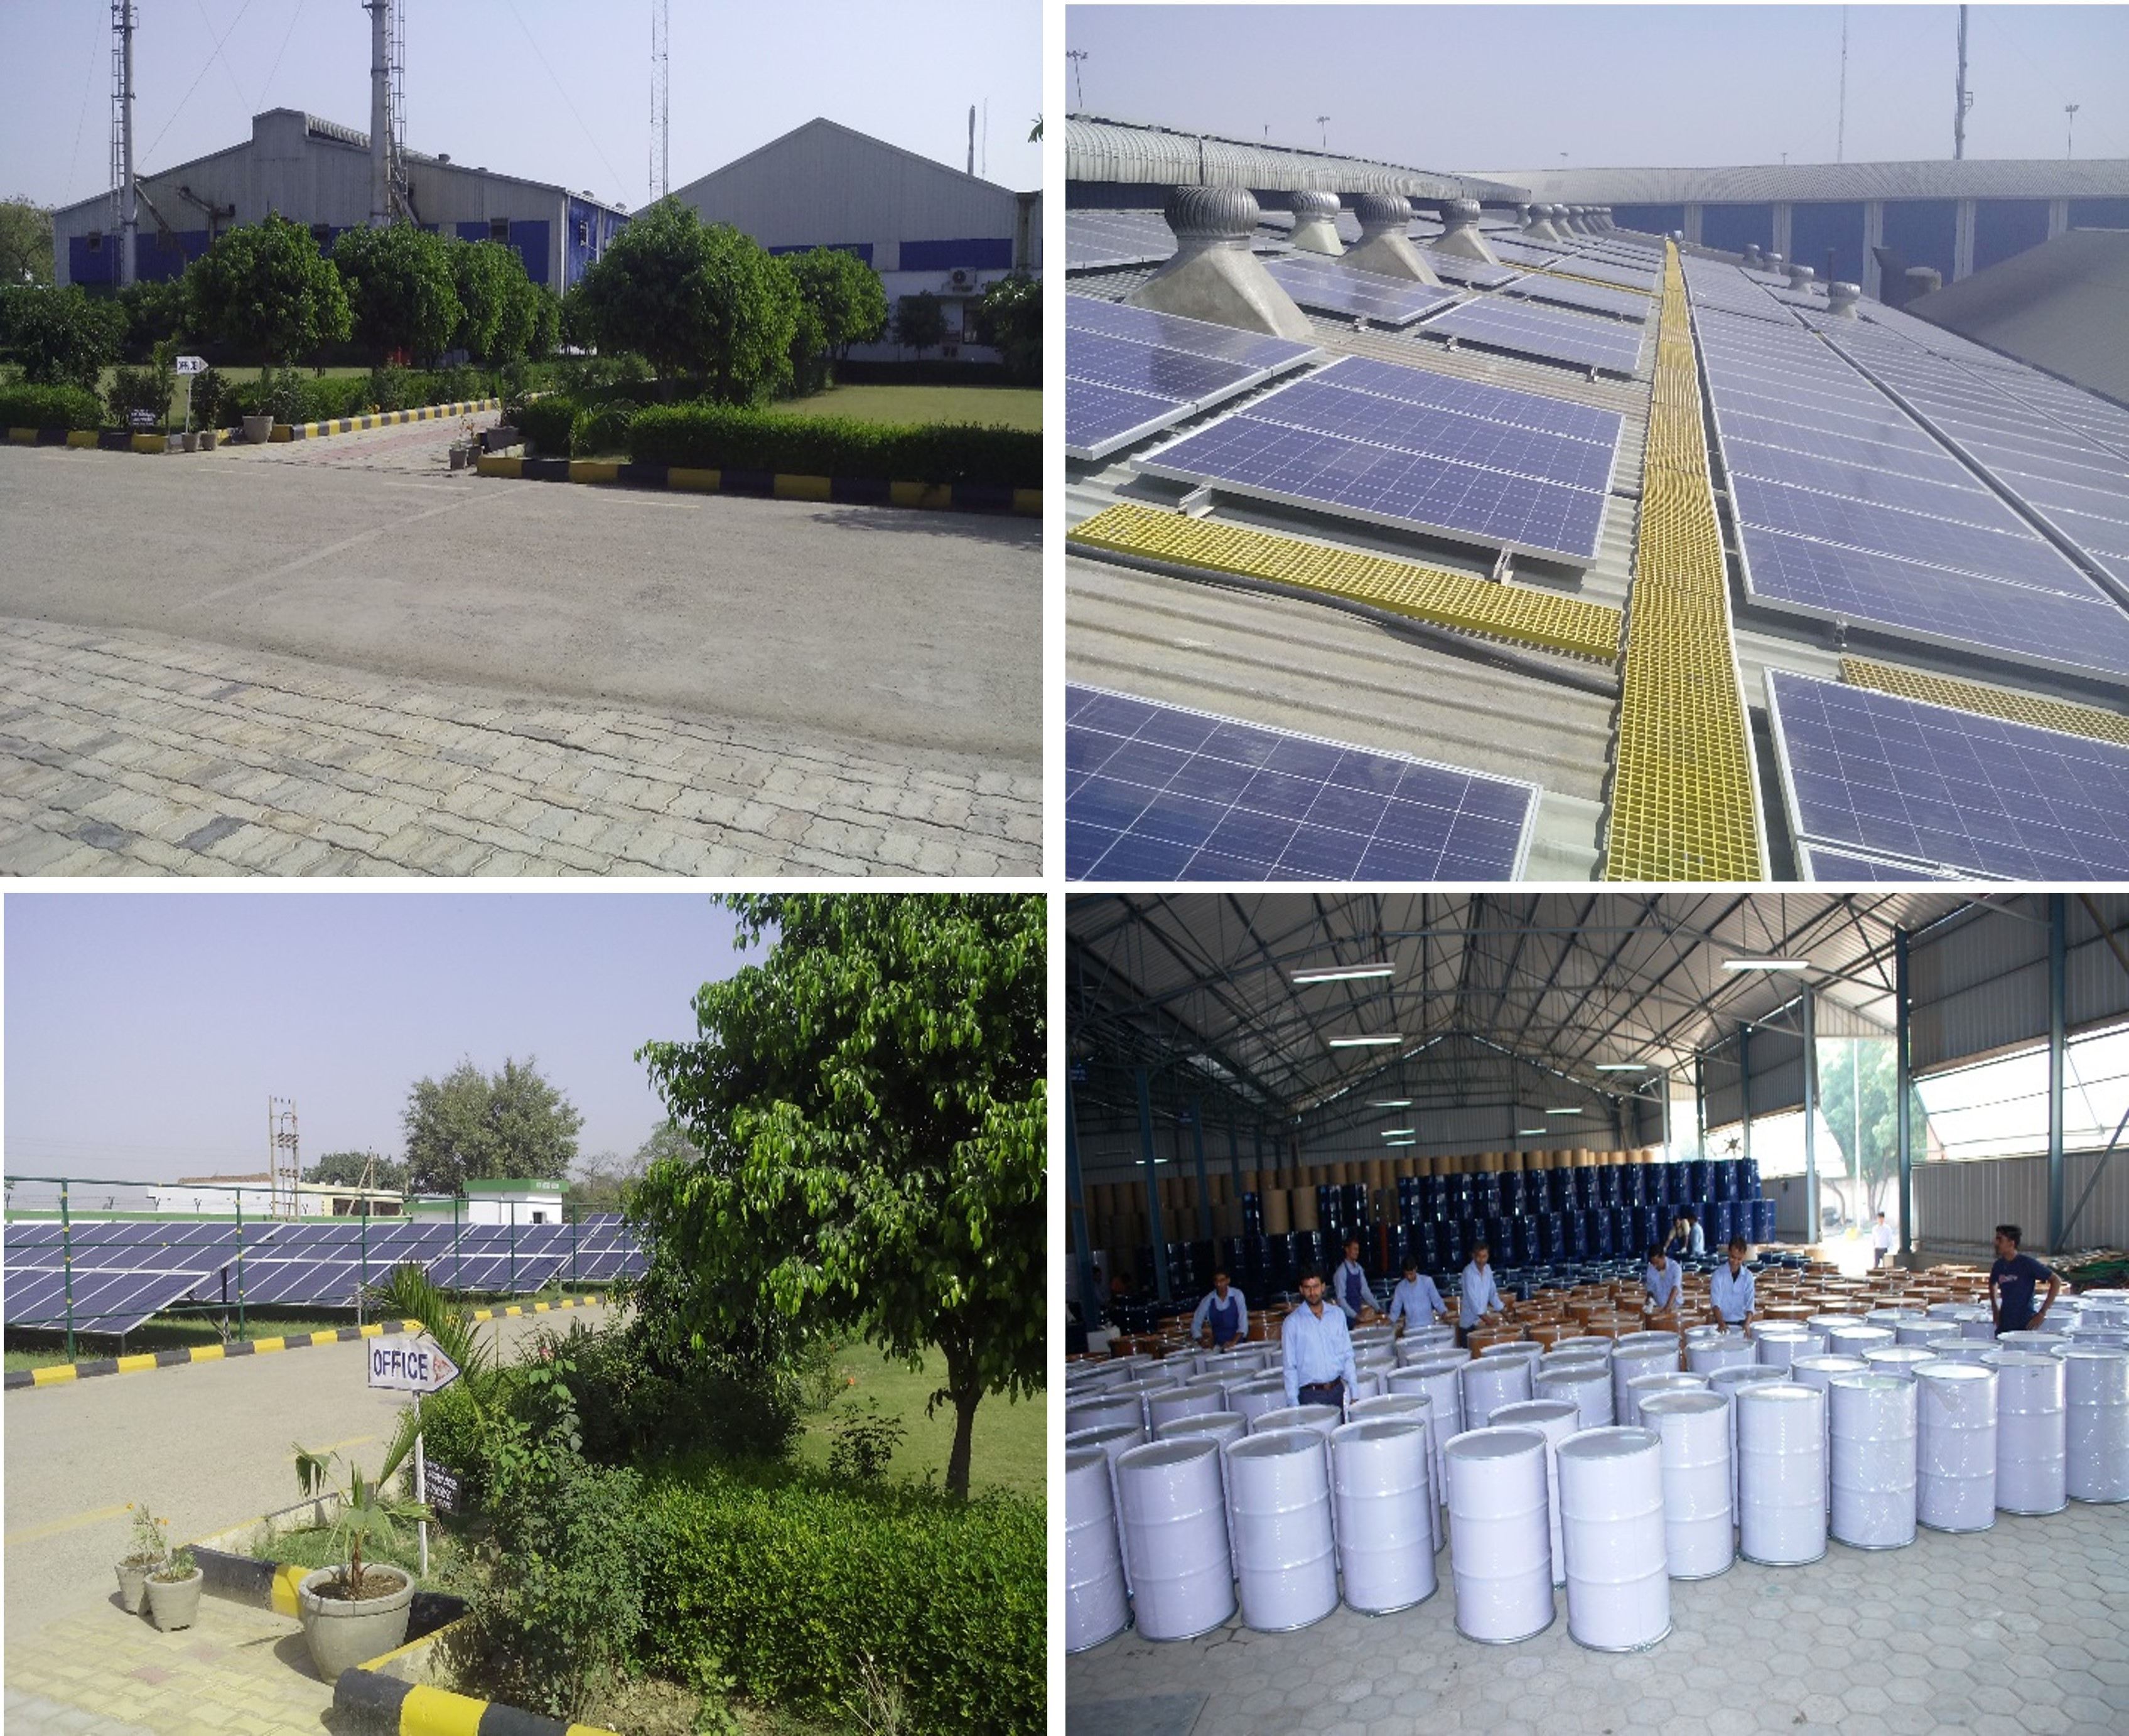 Industrial Packaging plant at Asaoti, Solar panels at IP Asaoti, Solar panels at IP Asaoti, Steel barrels manufactured at IP Asaoti